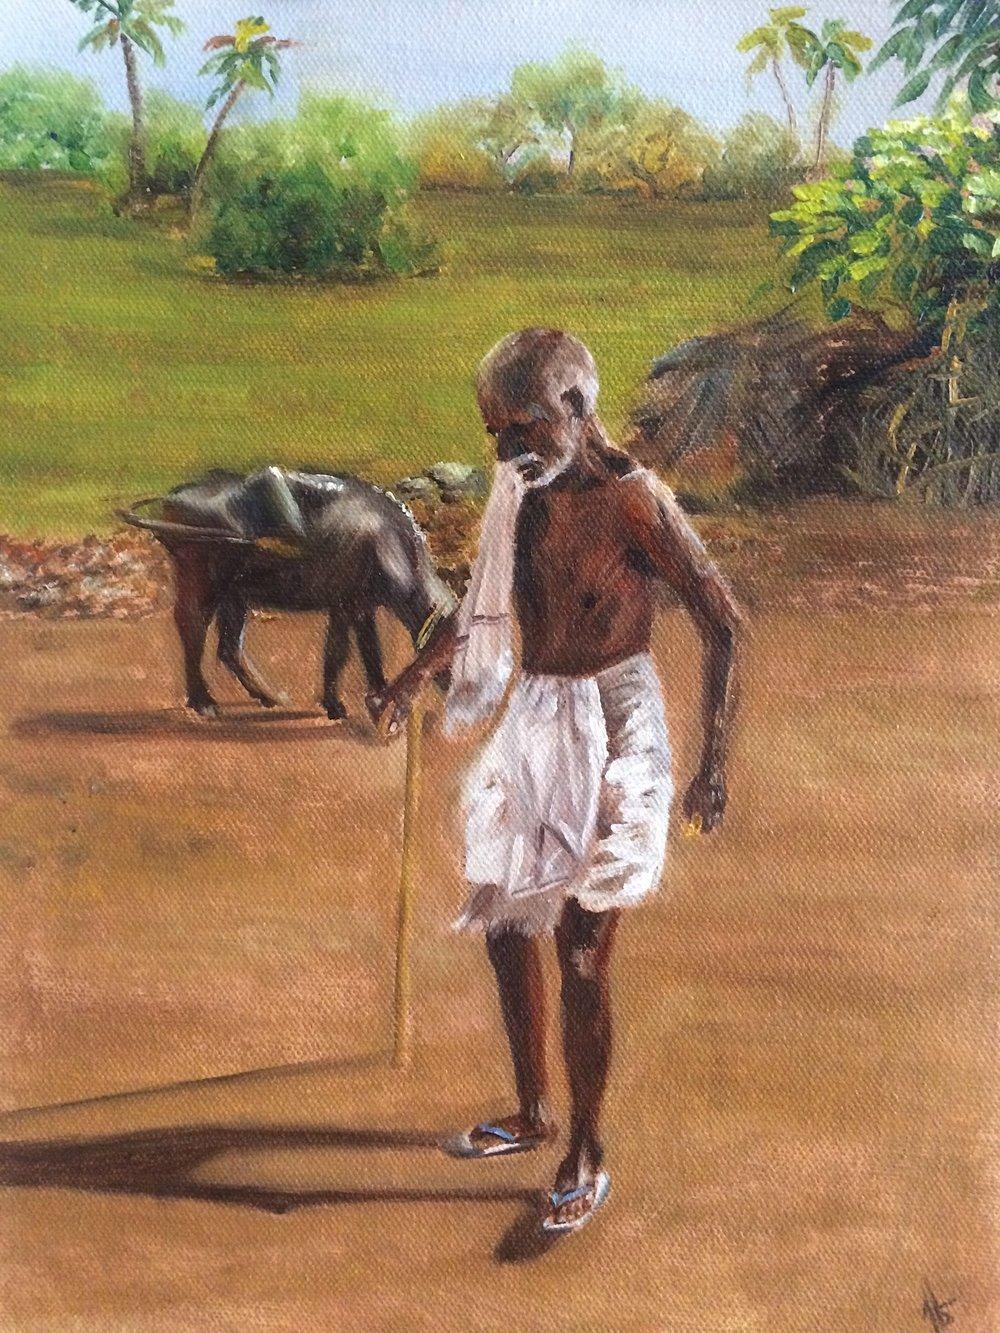 Abhinaya Ramadurai